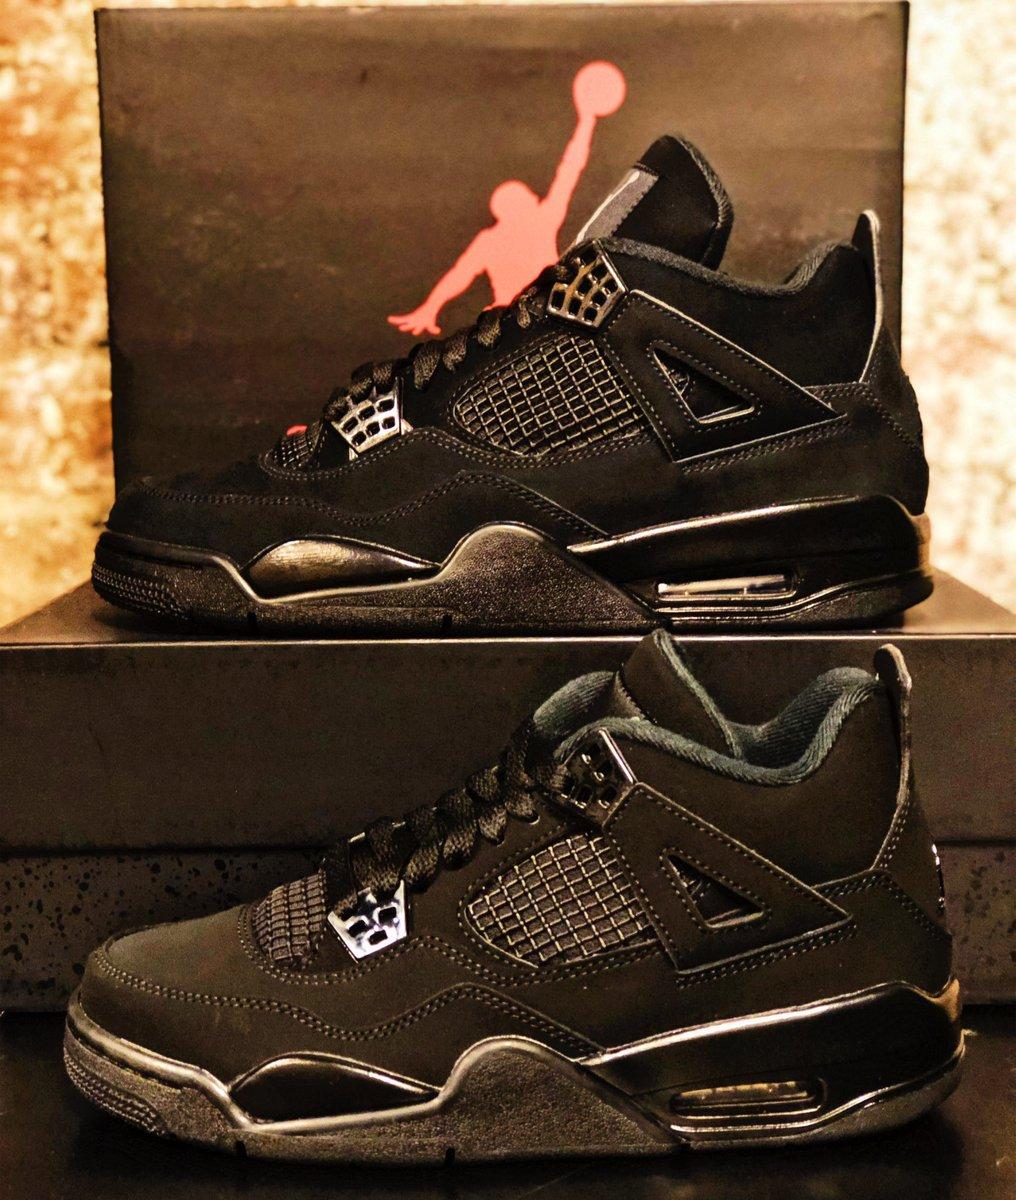 Air Jordan 4 Black Cat release Wednesday, January 22nd @NBAStore NYC!